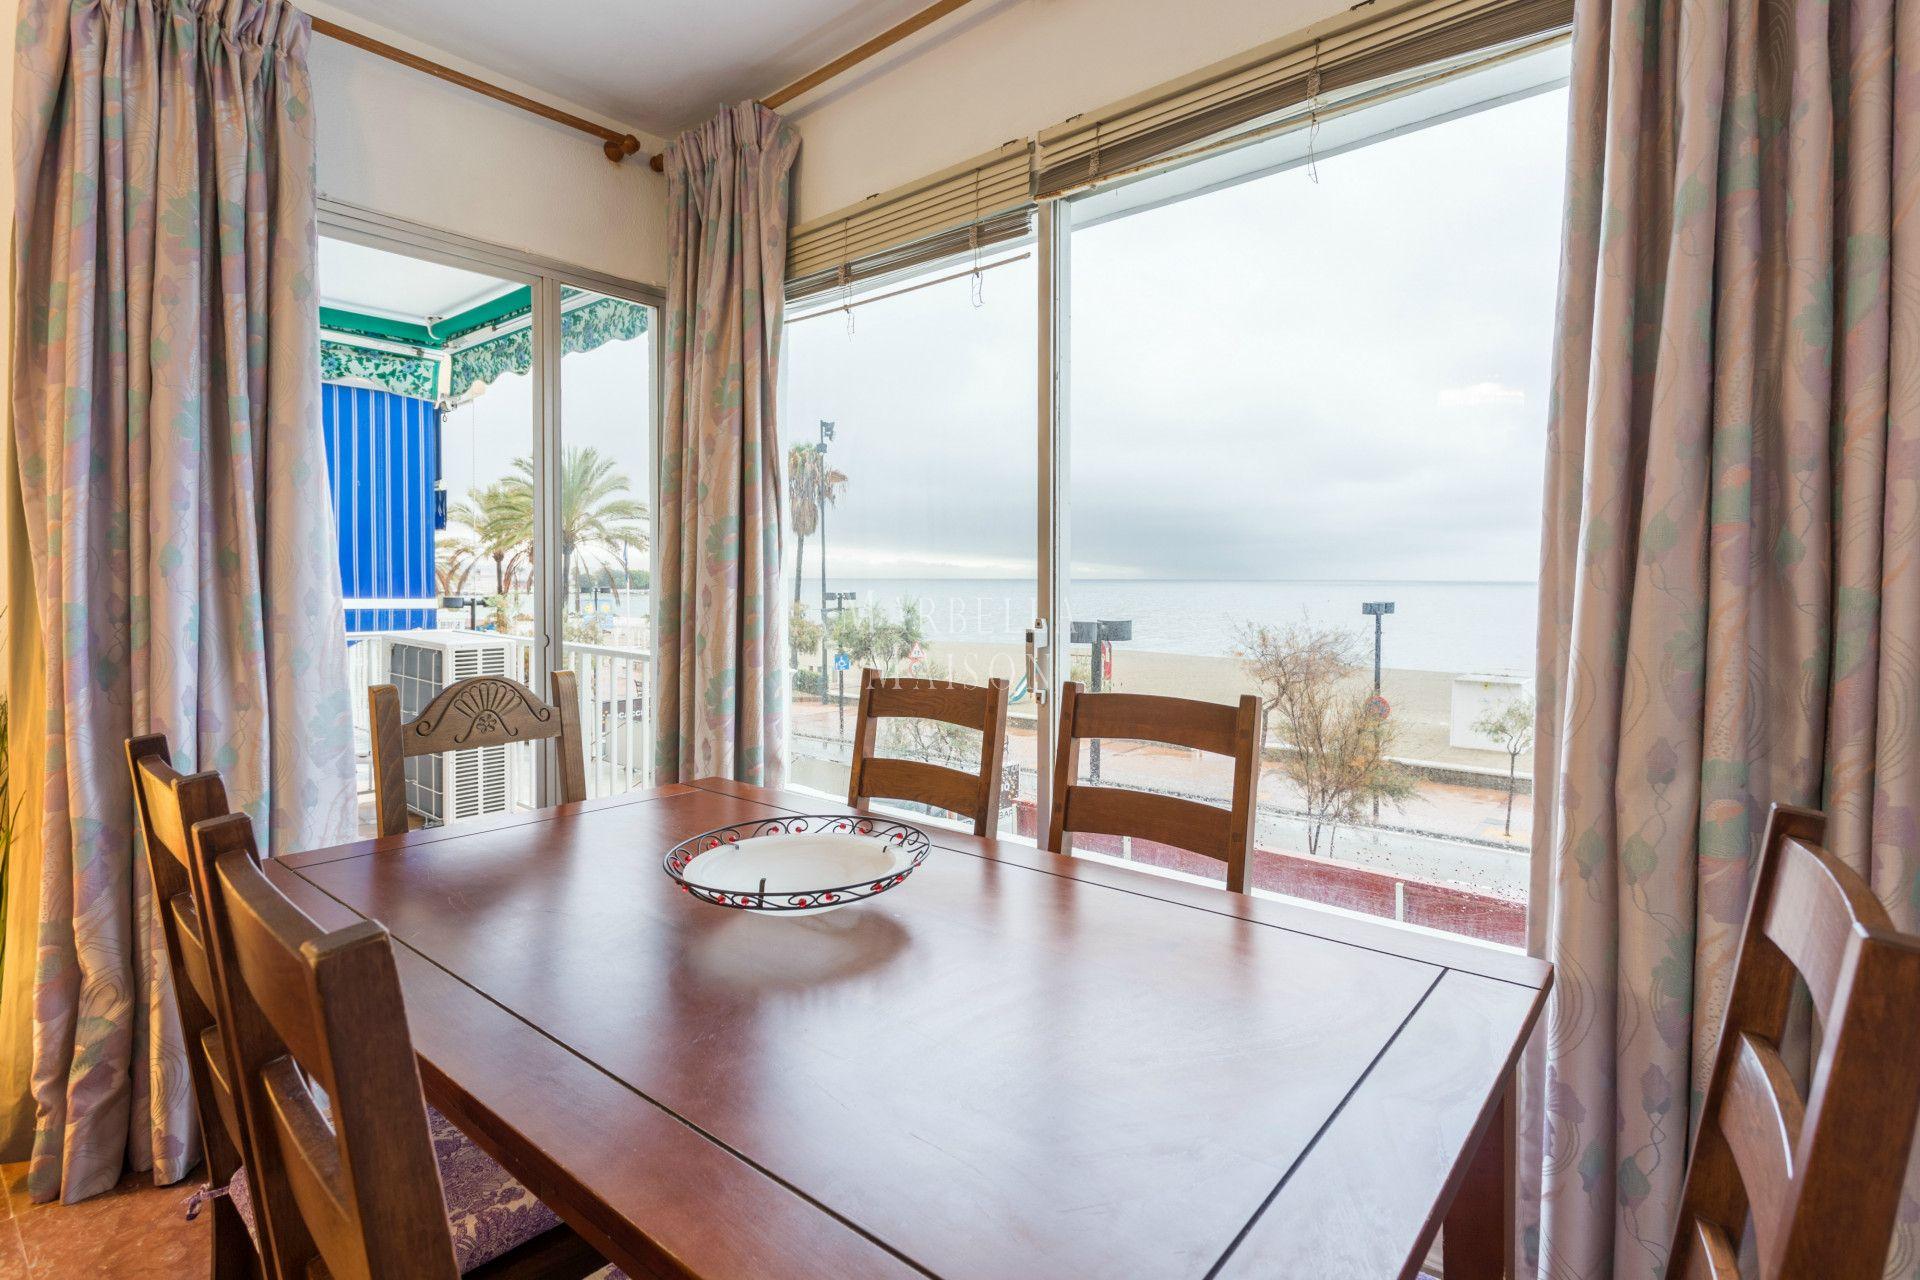 Apartamento en Paseo Marítimo de Fuengirola! en Fuengirola